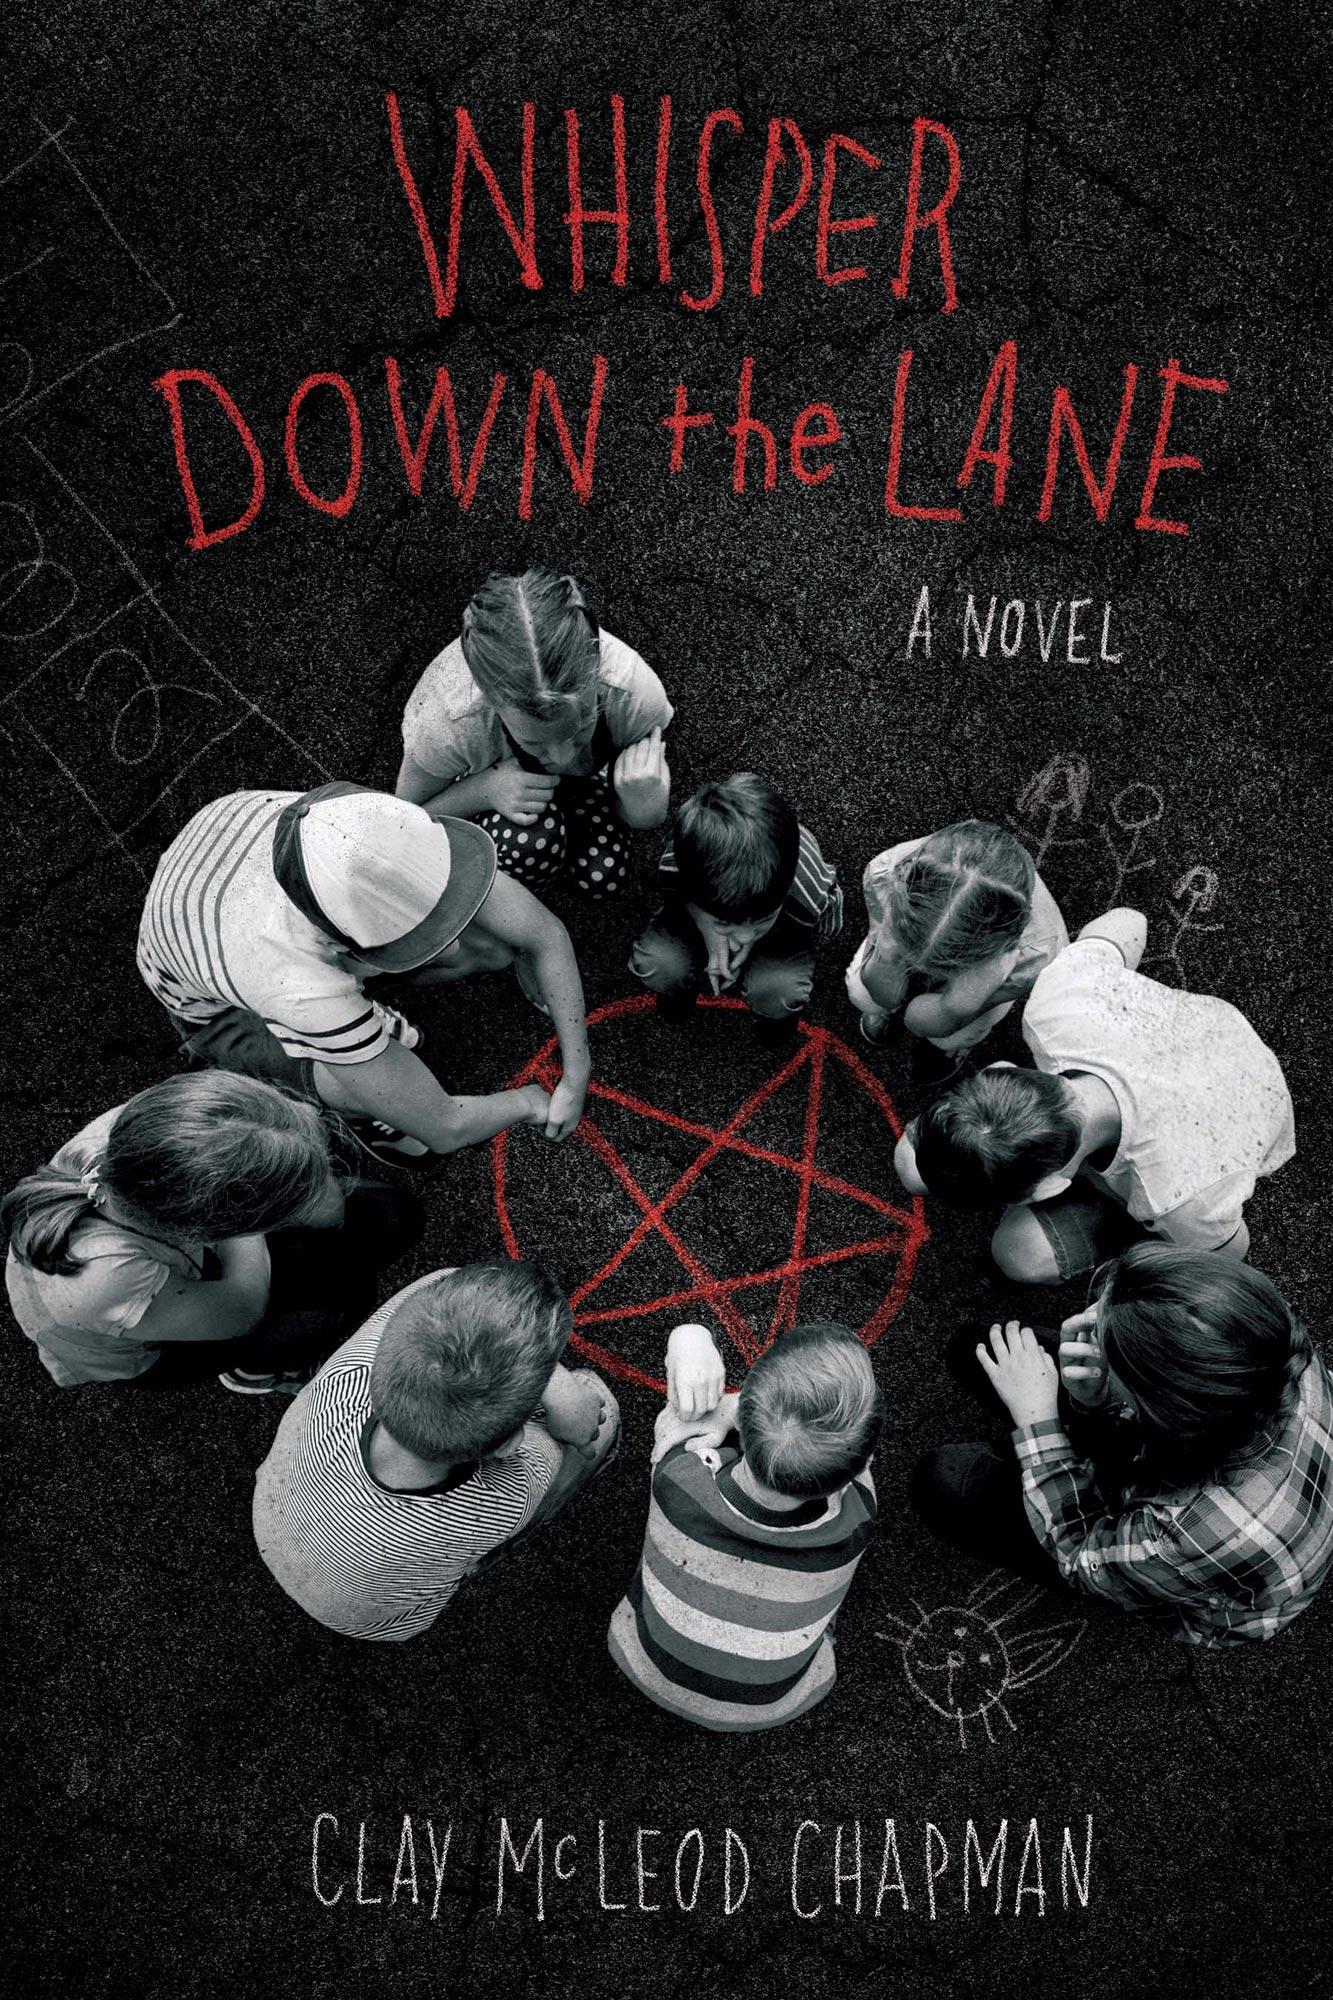 Whisper Down The Lane by Clay McLeod Chapman